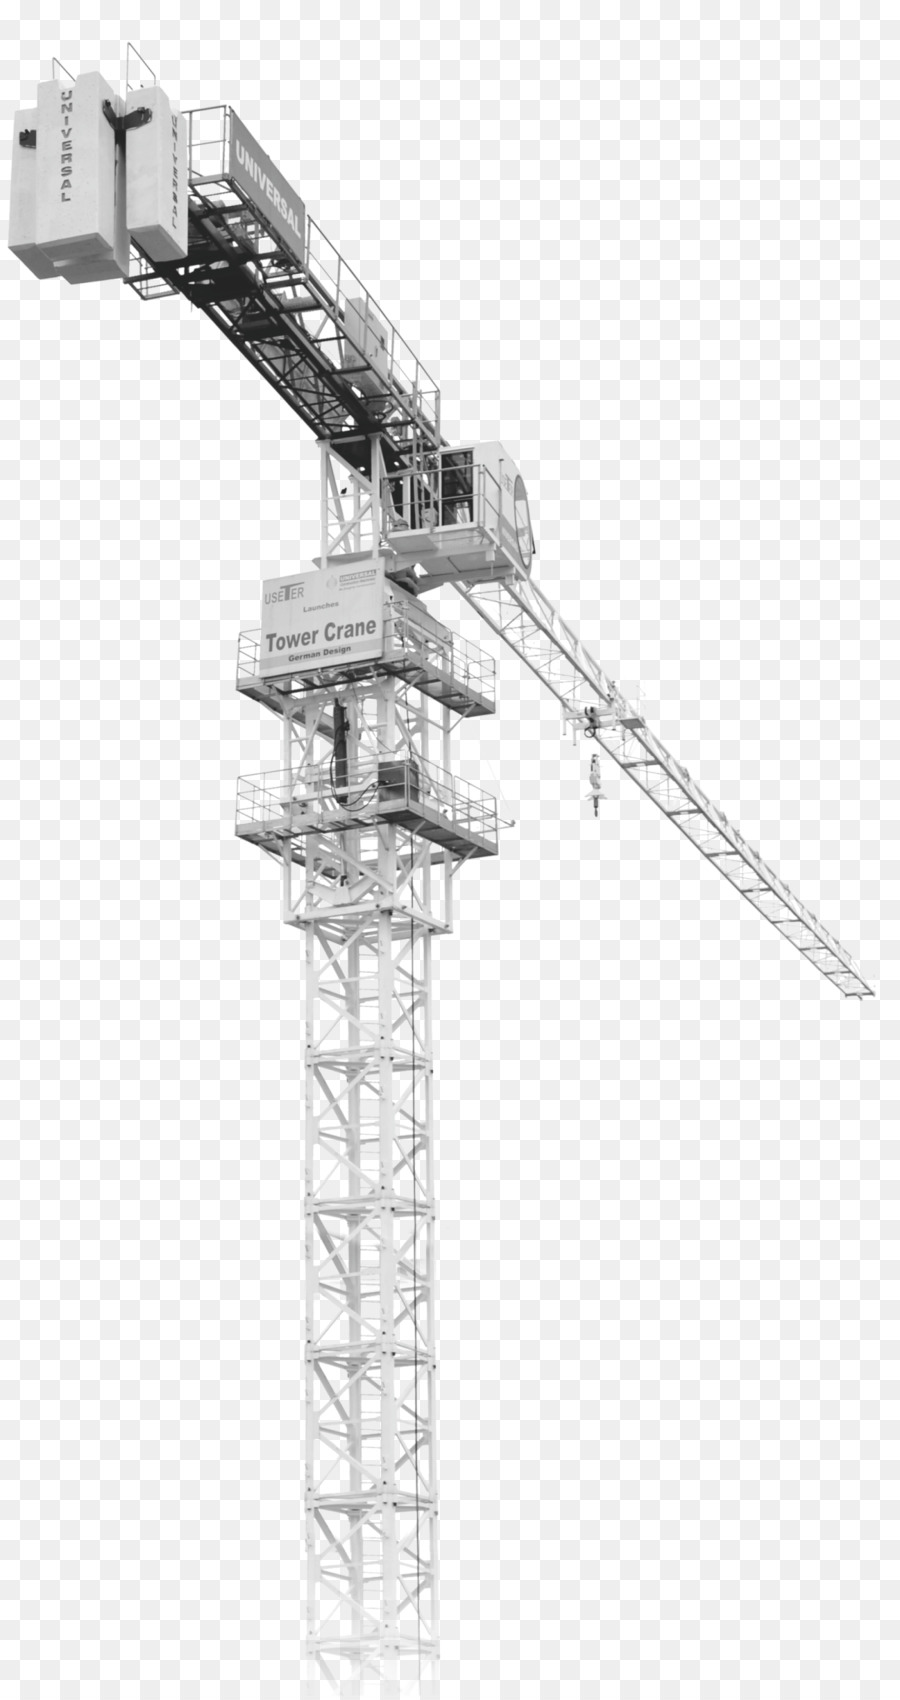 Crane Structure png download - 1193*2249 - Free Transparent Crane